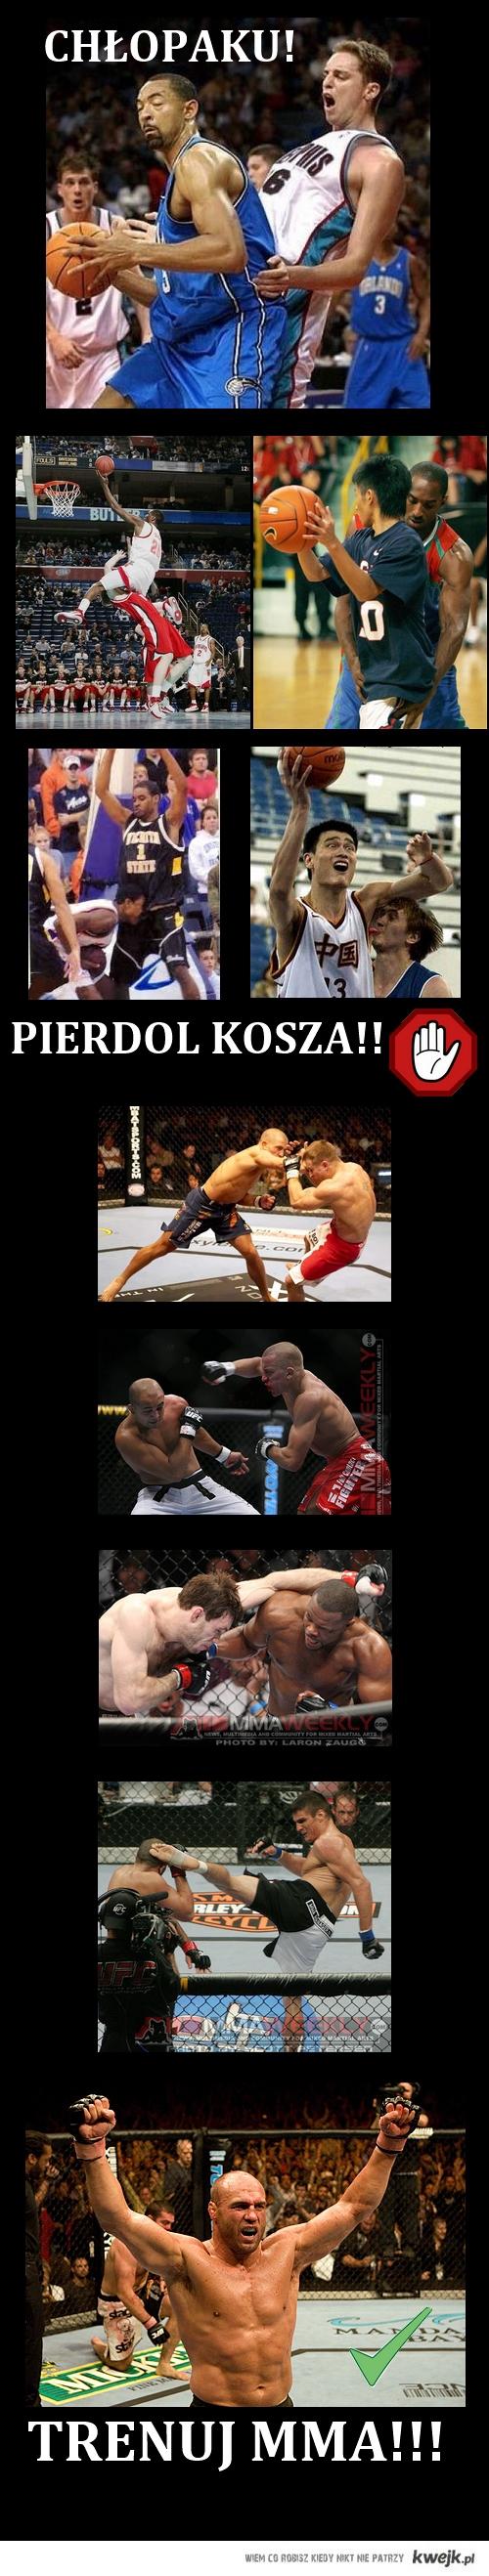 MMA PANOWIE!